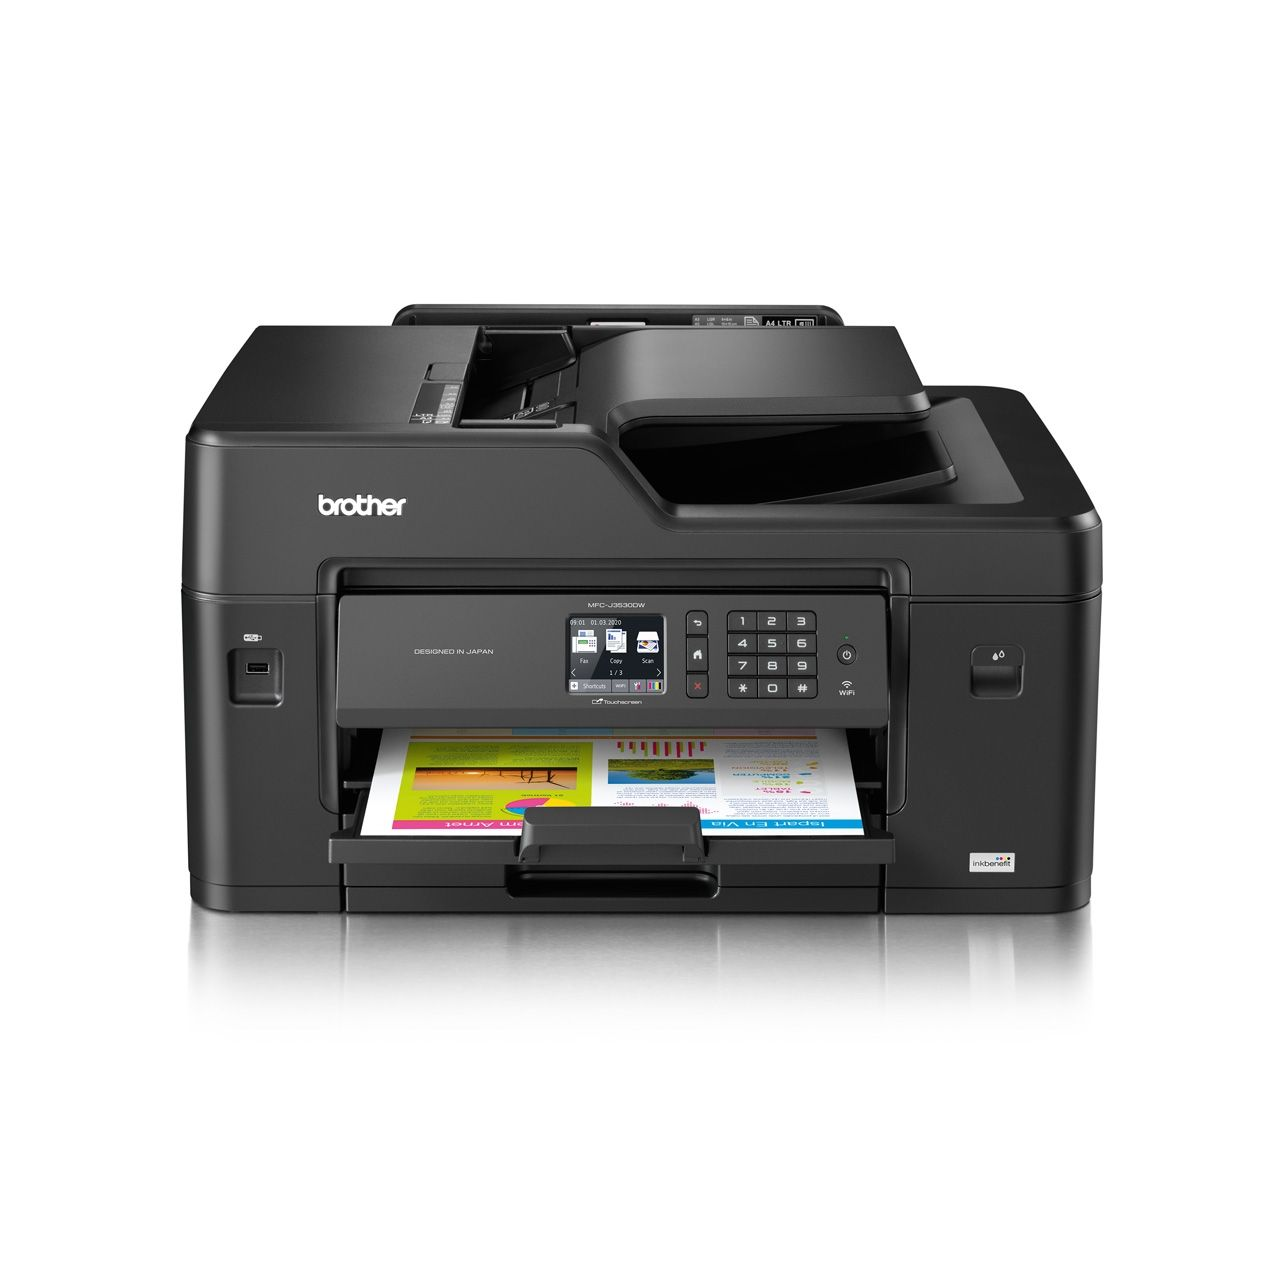 Brother MFC-9700 Scanner Resolution Improvement Driver UPDATE